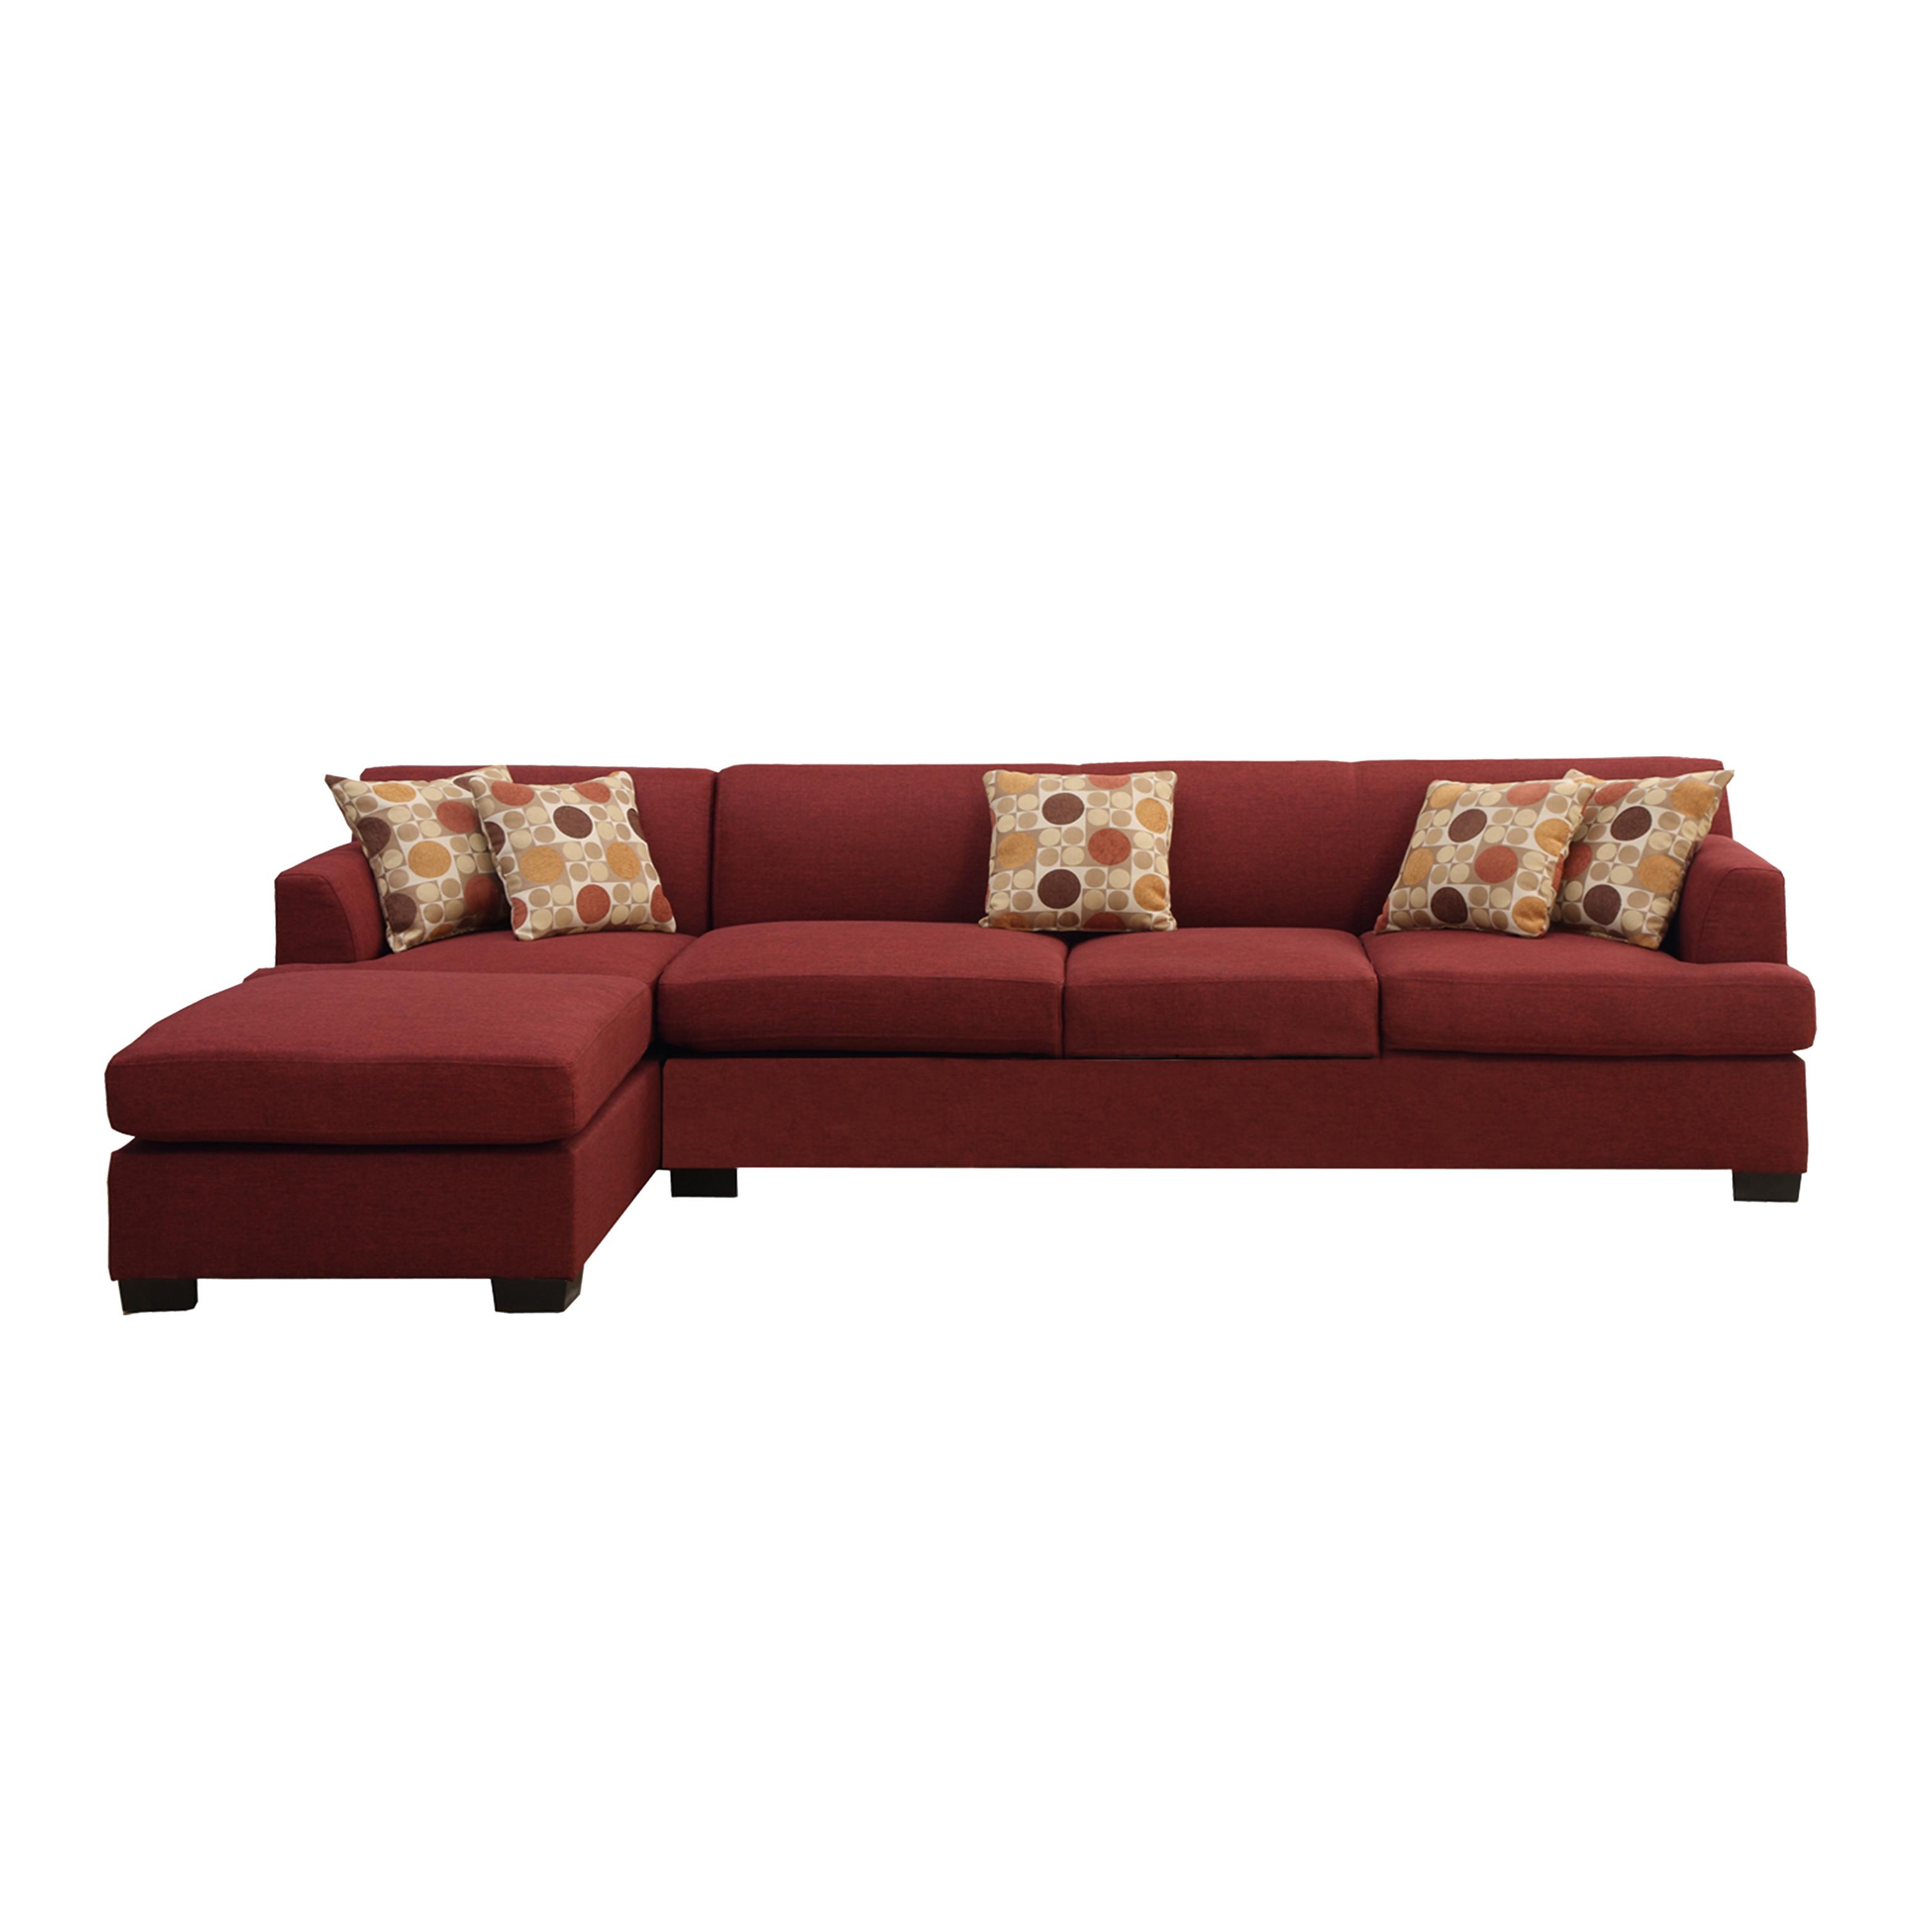 bobkona sectional sofa embly instructions venta de fundas para sofas en chile amazing poundex modular homesfeed